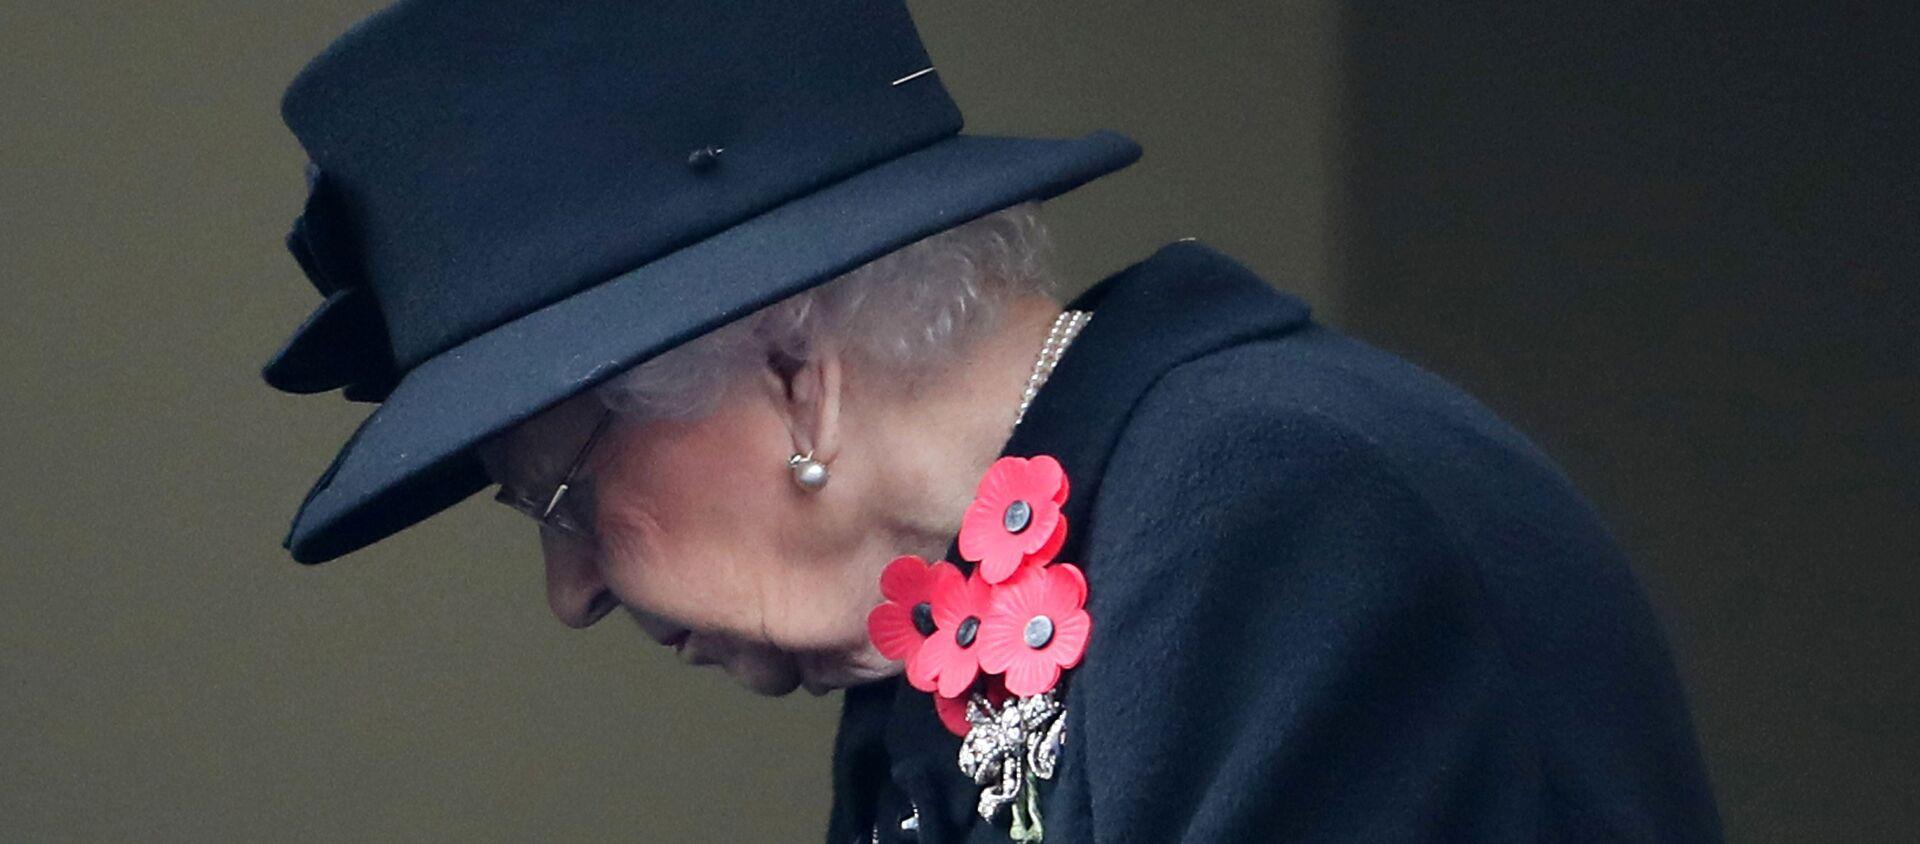 Isabell II, monarca británica - Sputnik Mundo, 1920, 22.11.2020